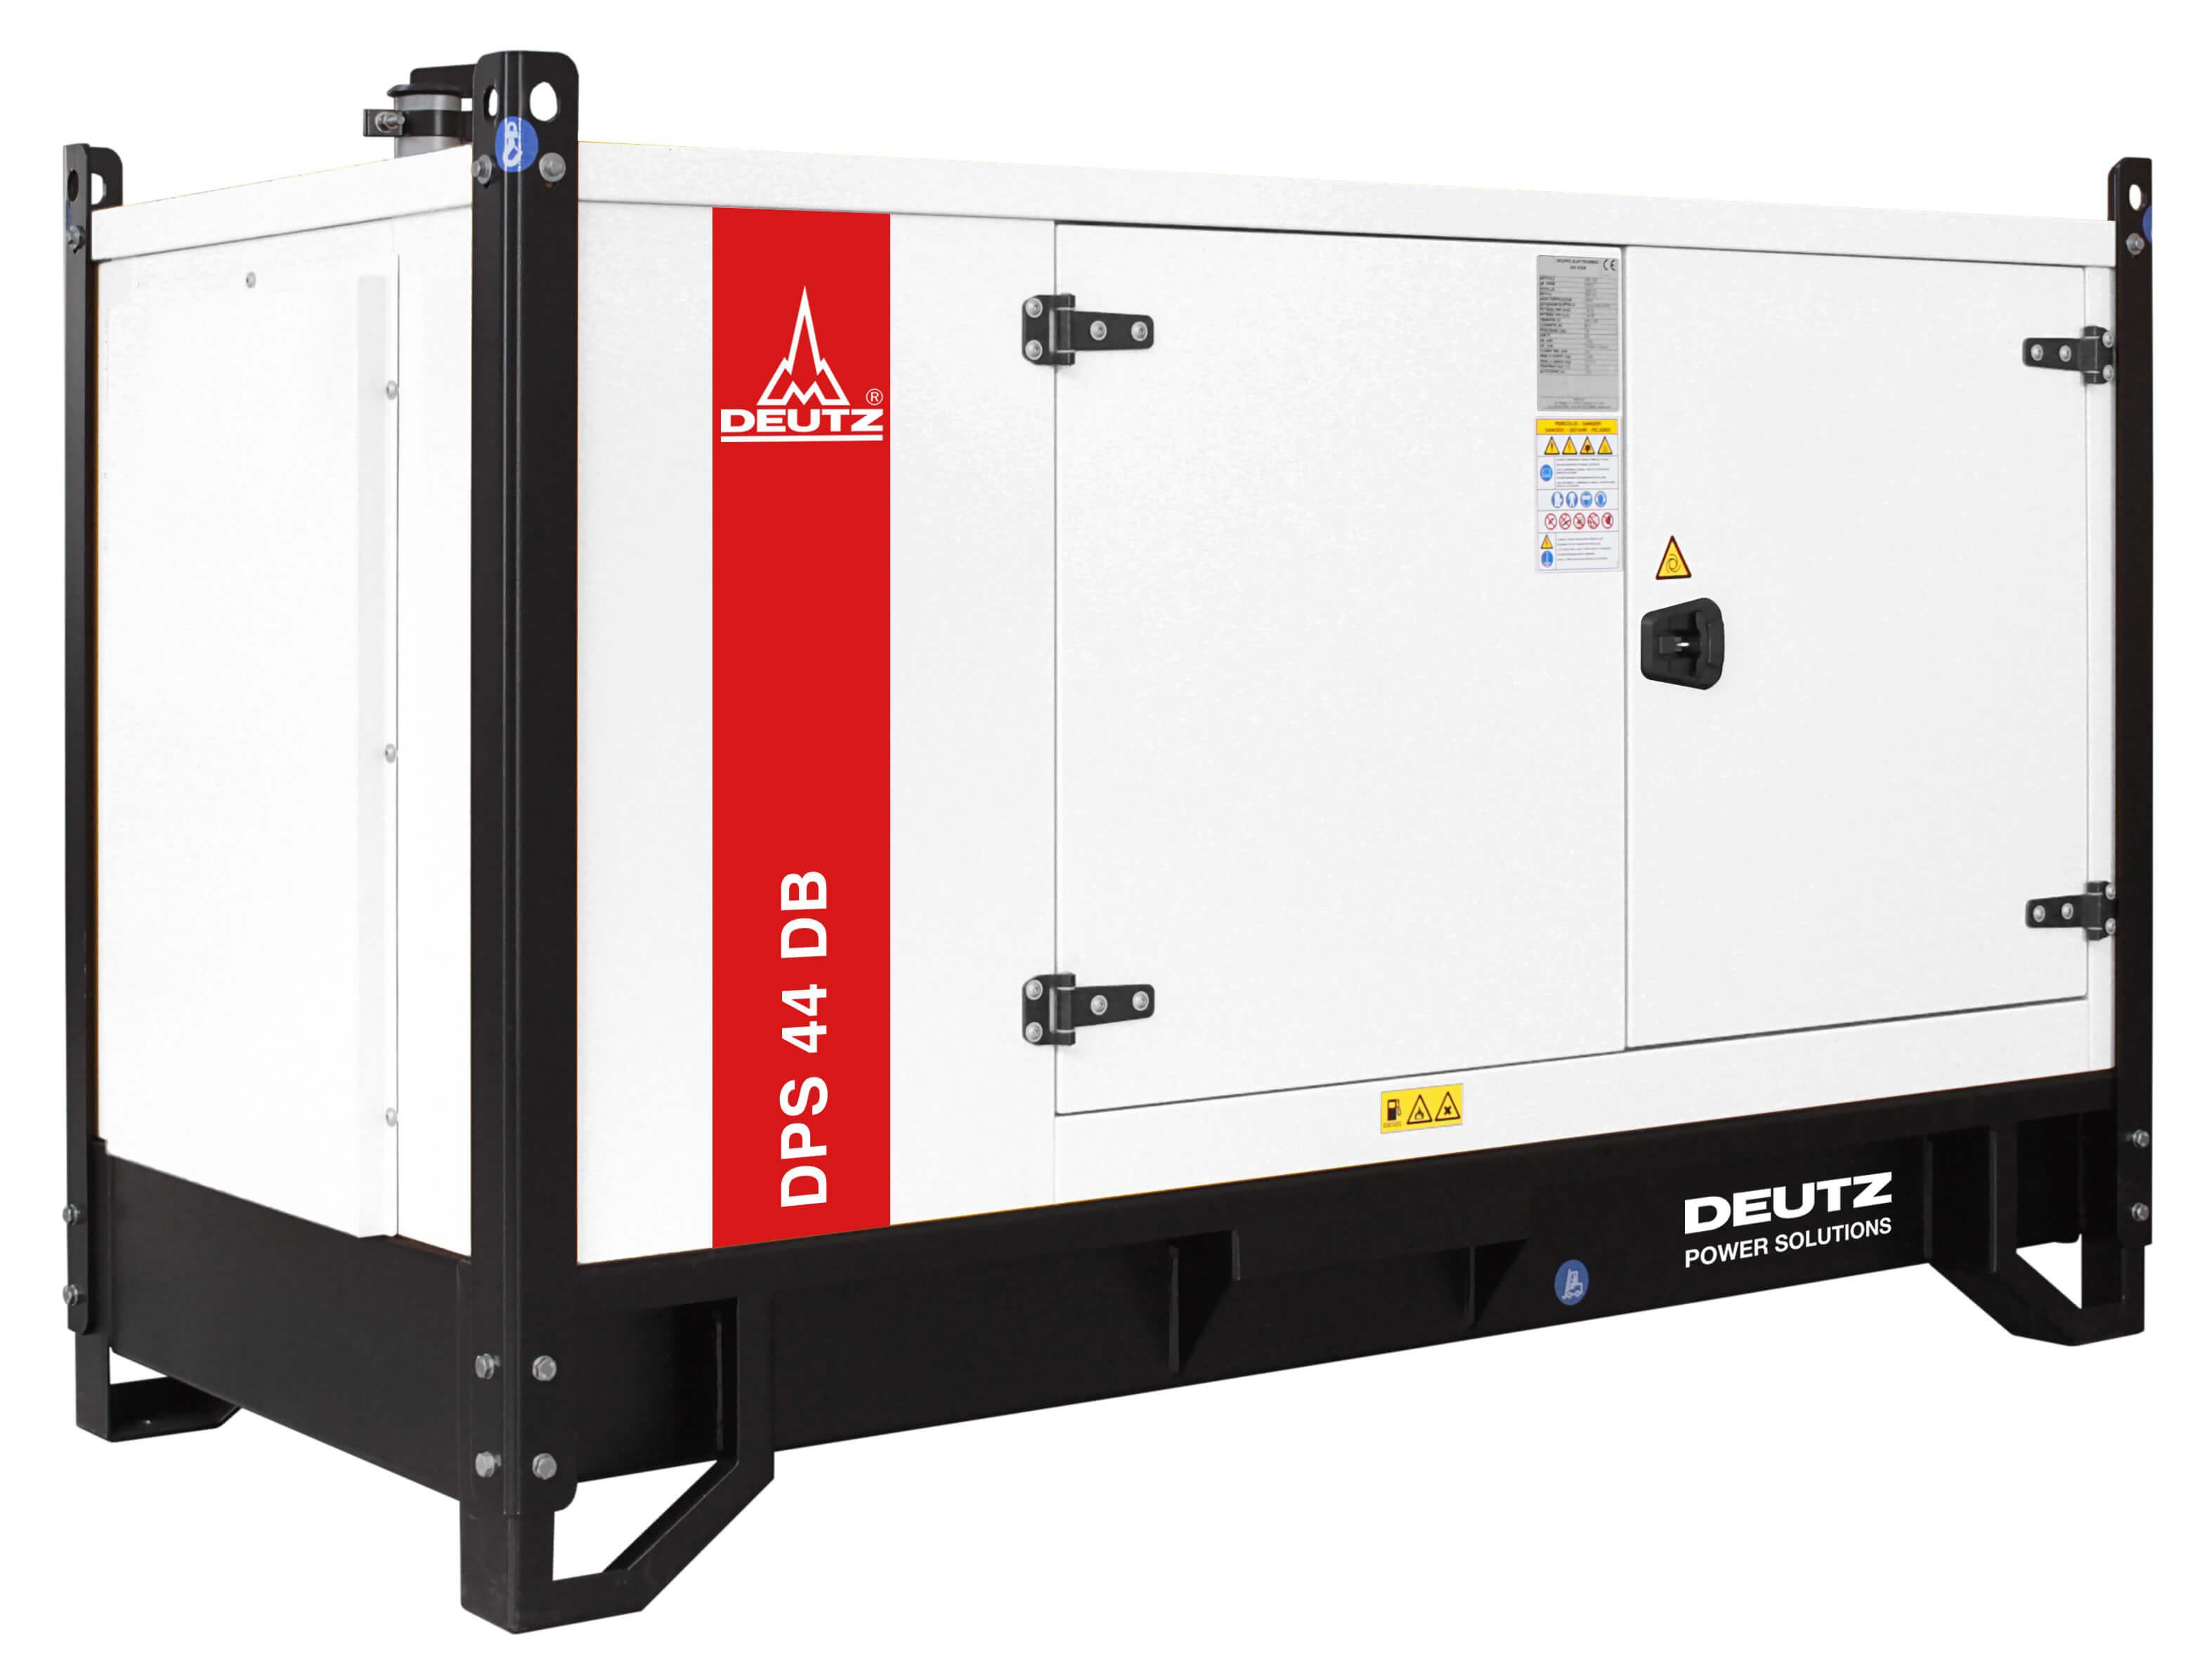 Deutz DPS 44 diesel generator